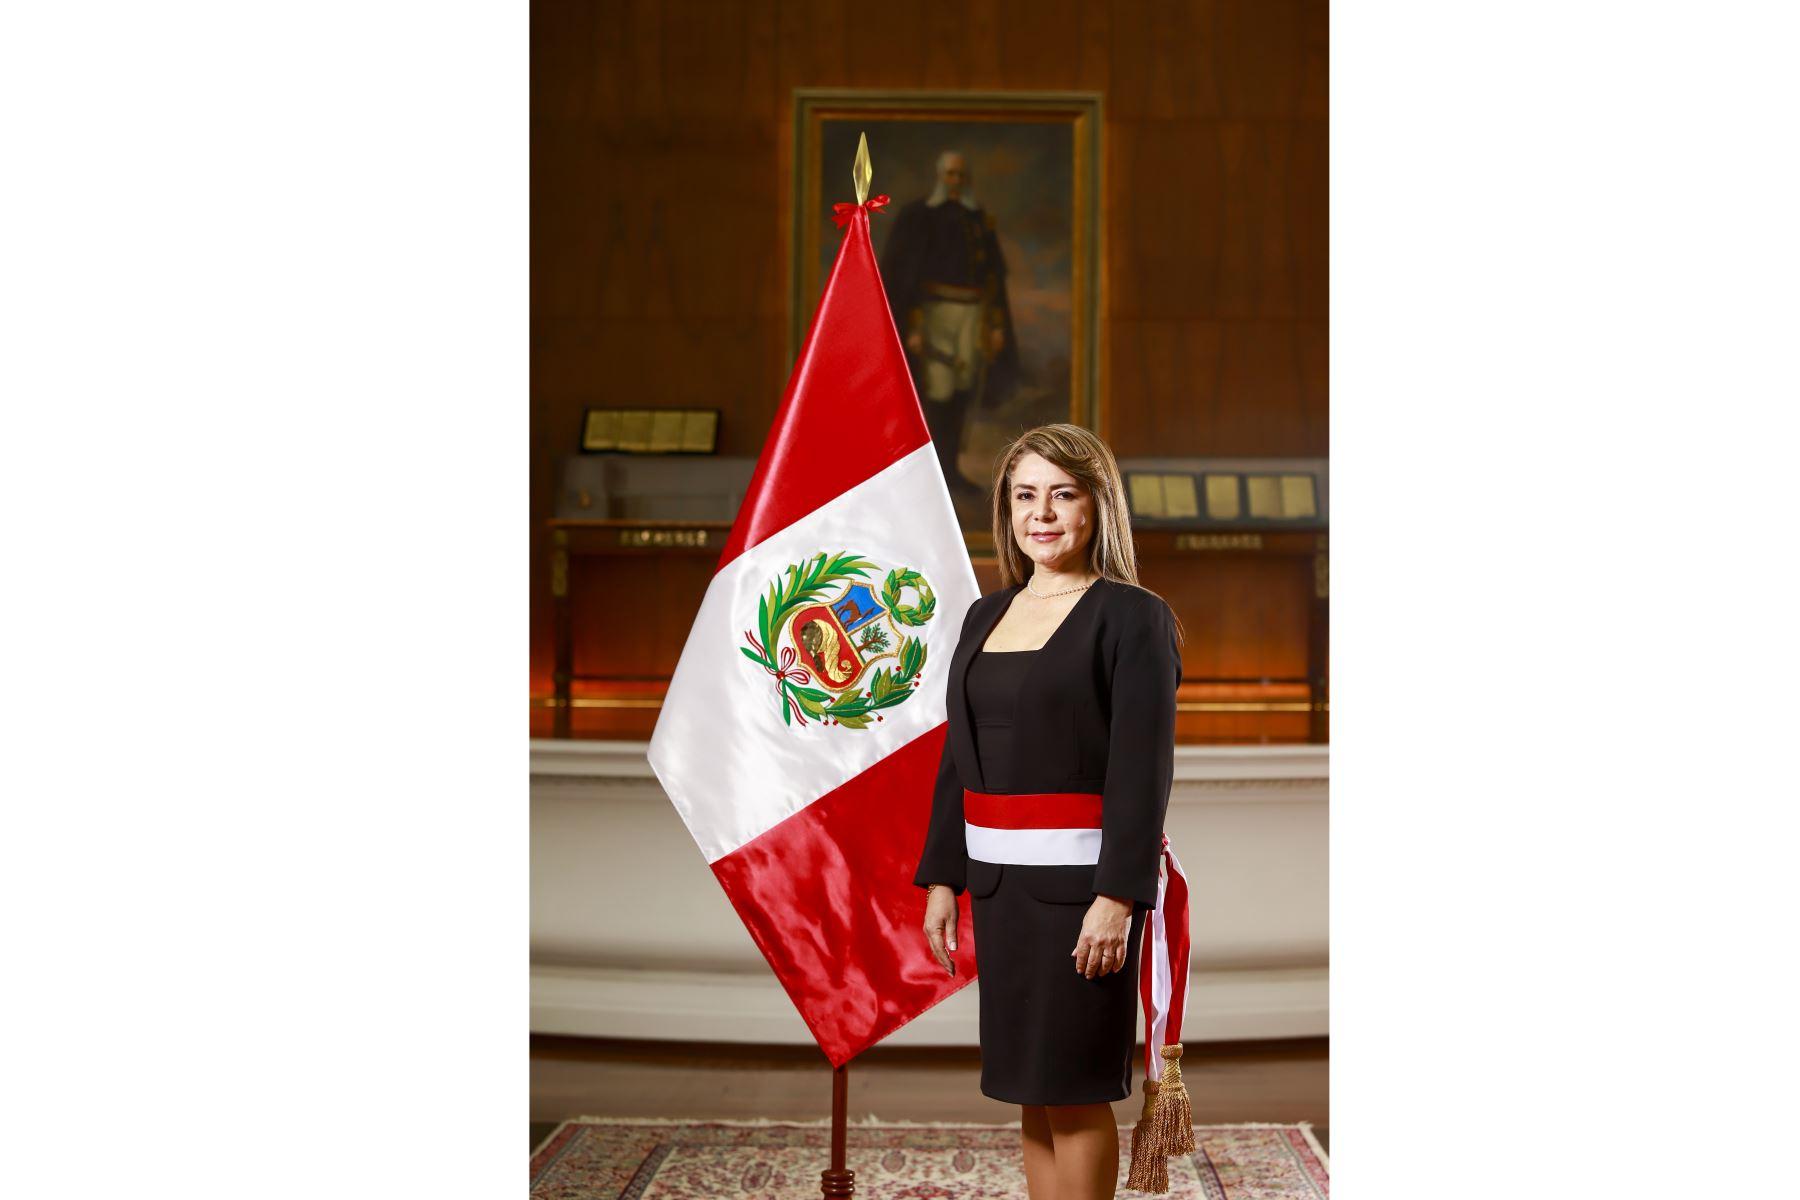 Presidente Martín Vizcarra toma juramento a Elizabeth Hinostroza Pereyra como ministra de Salud. Foto: ANDINA/Prensa Presidencia